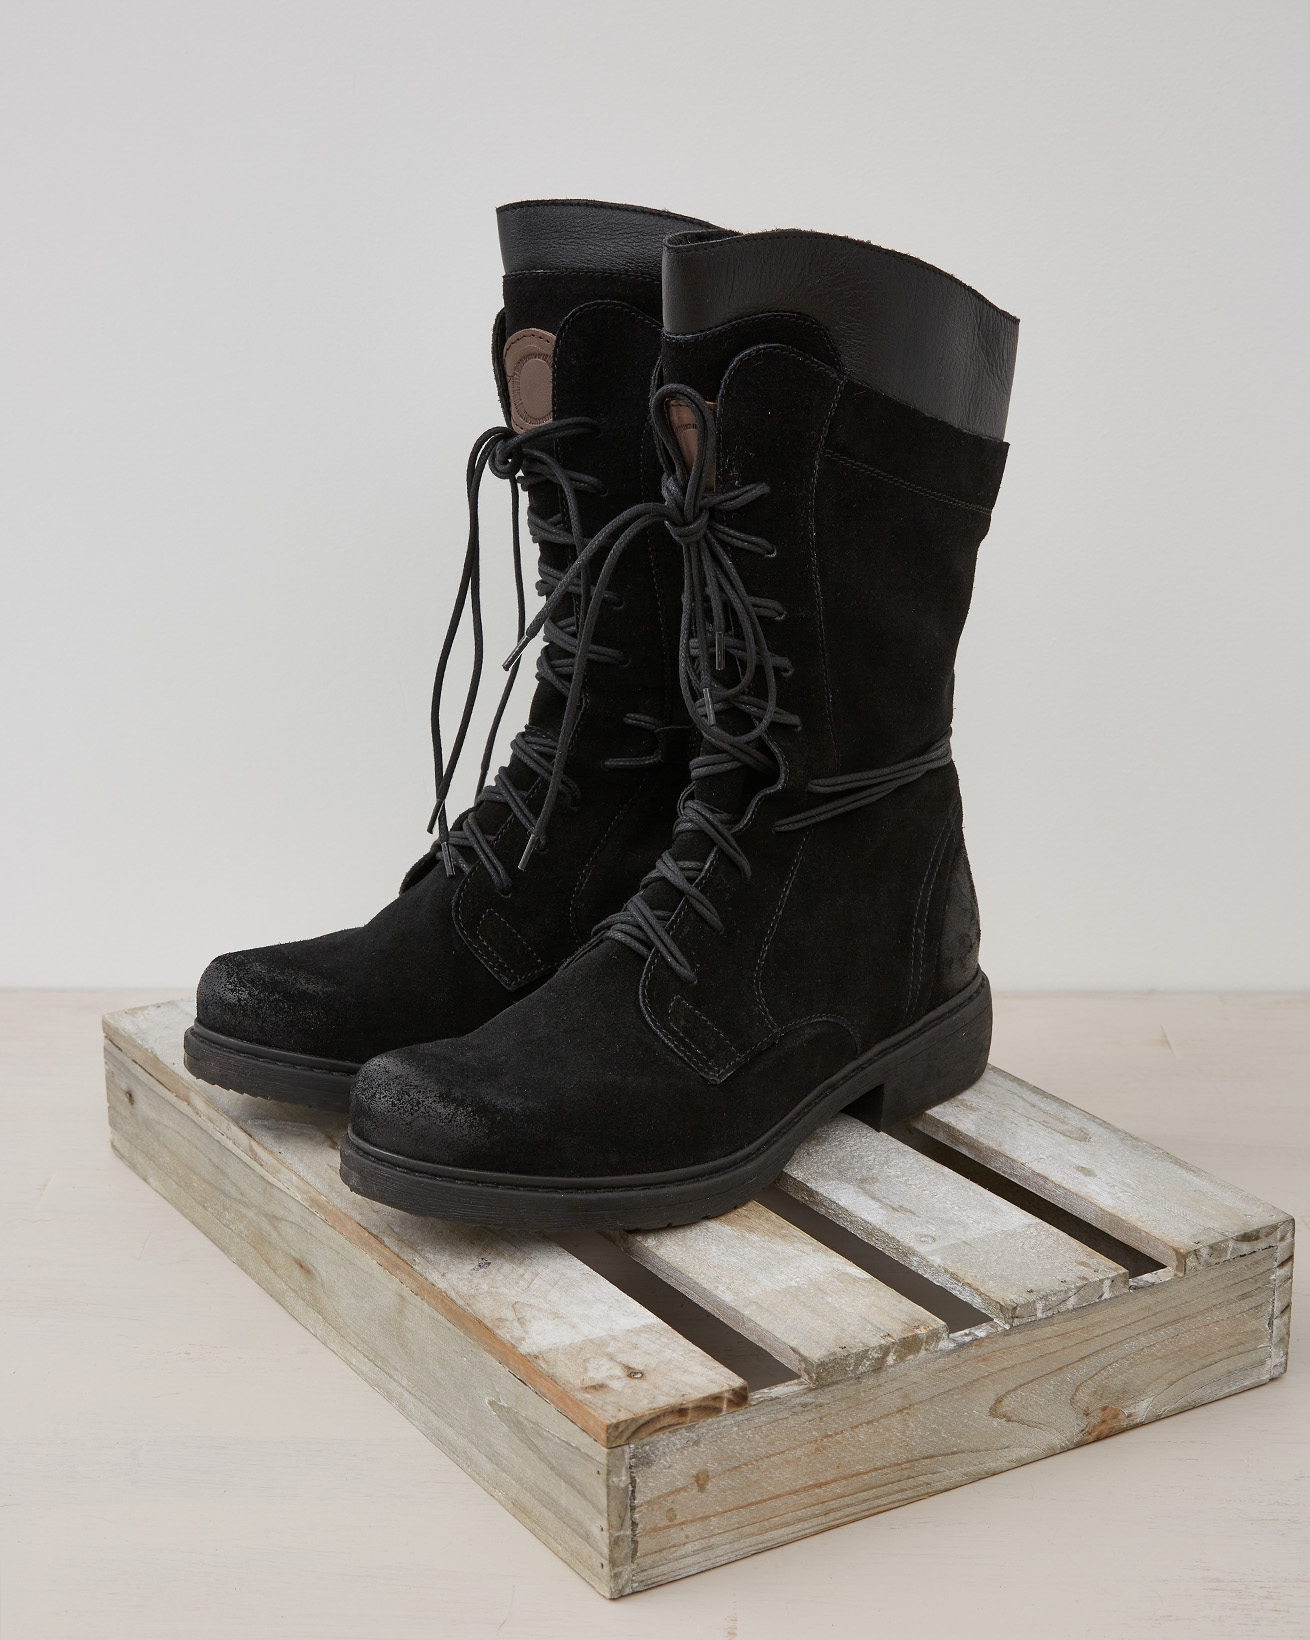 Woodsman Boot - Black - Size 39 - 2449